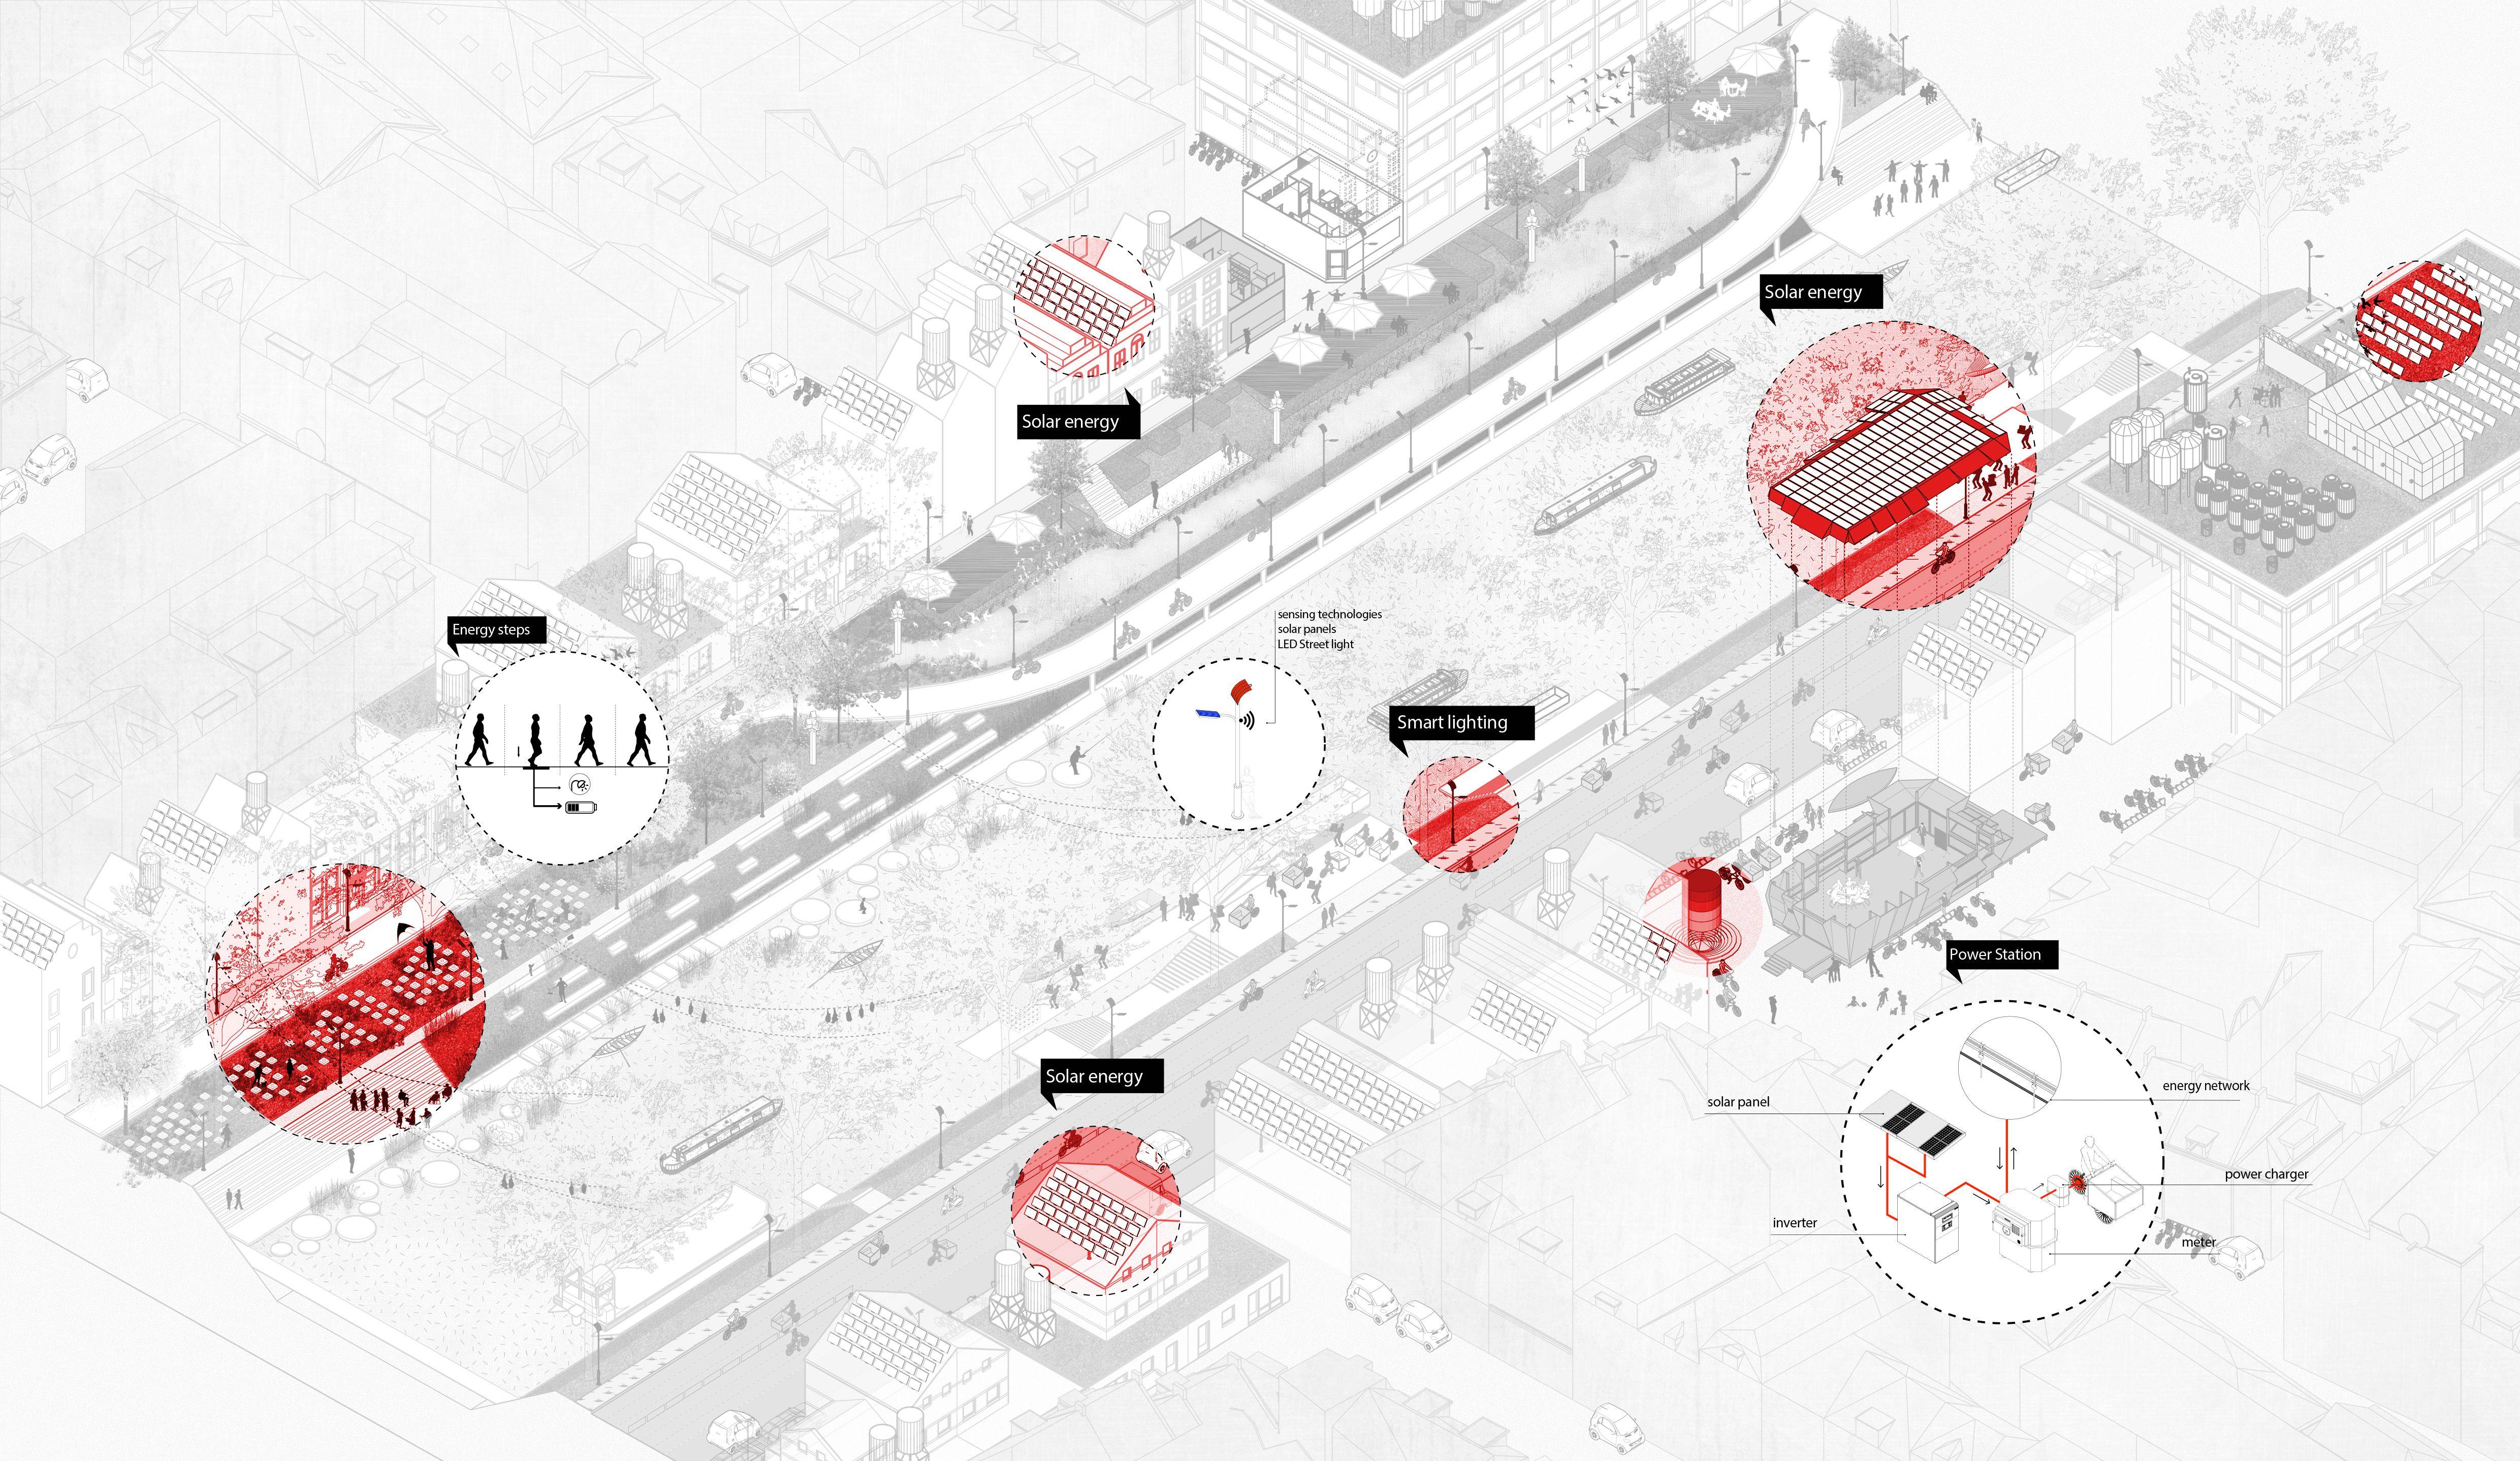 Atelier Stad Breda - Urban Strategy by FABRICations. Urban development - Energy transition - Energetic plan - Urban design - Urban Revitalization - Resilient system - Architecture - Urbanism - Metabolism #urbanesdesign